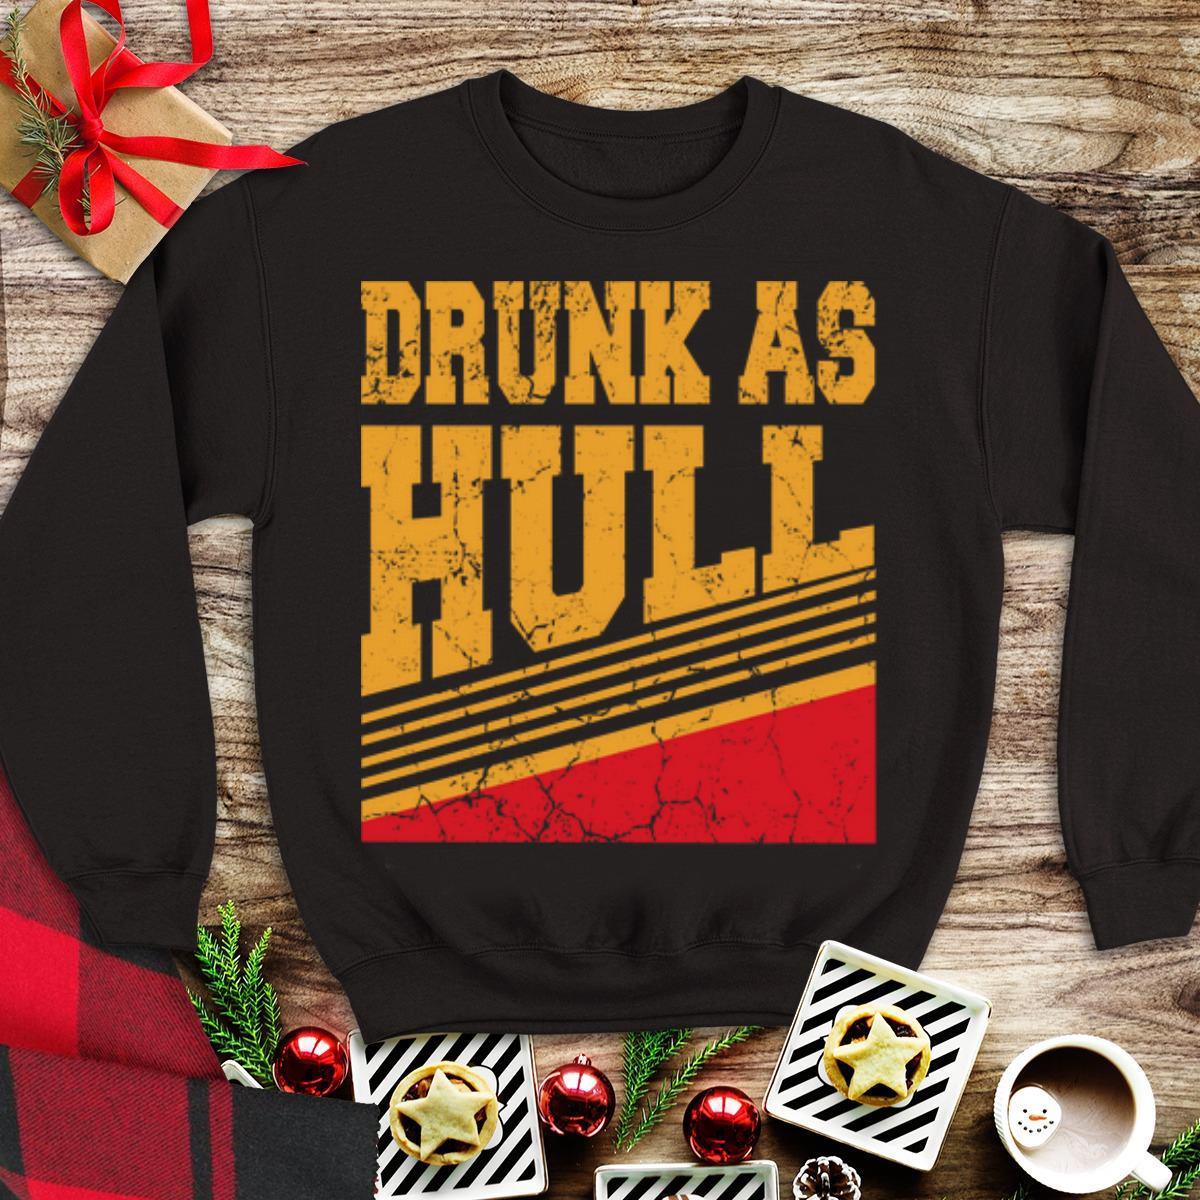 Drunk As Hull shirt 1 - Drunk As Hull shirt